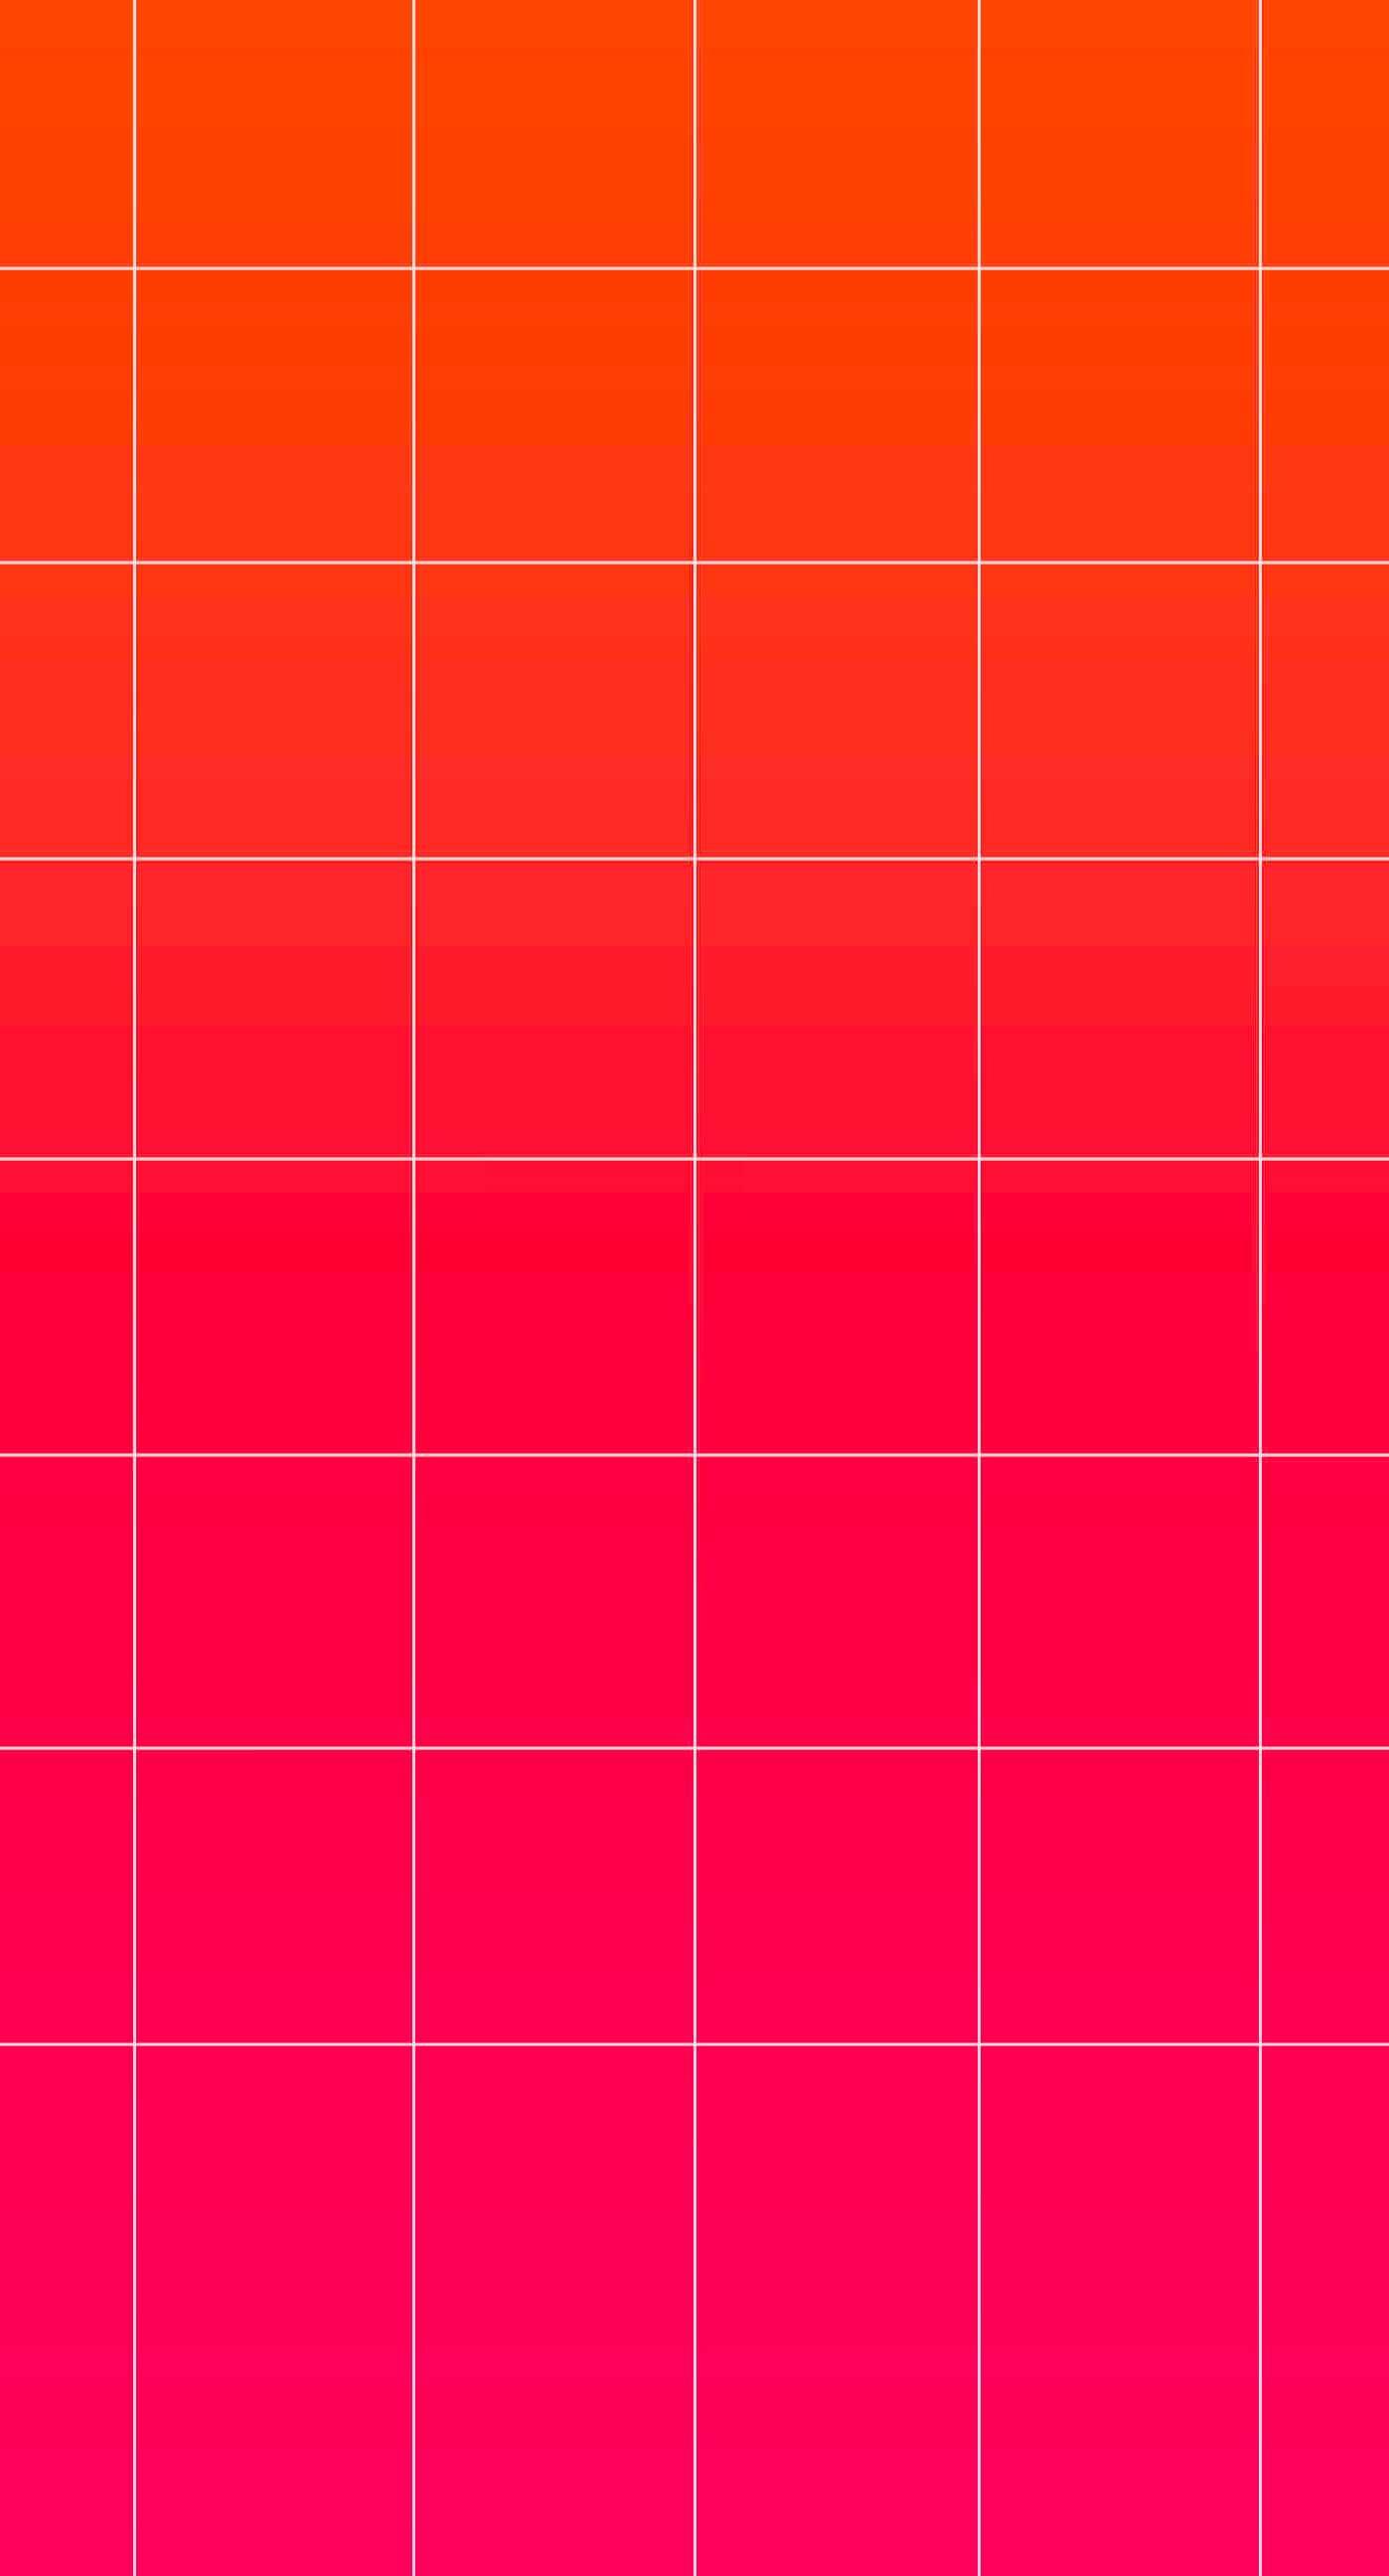 red gradient border shelf wallpaper sc iphone6splusiphone 6s plus iphone 6 plus wallpaper